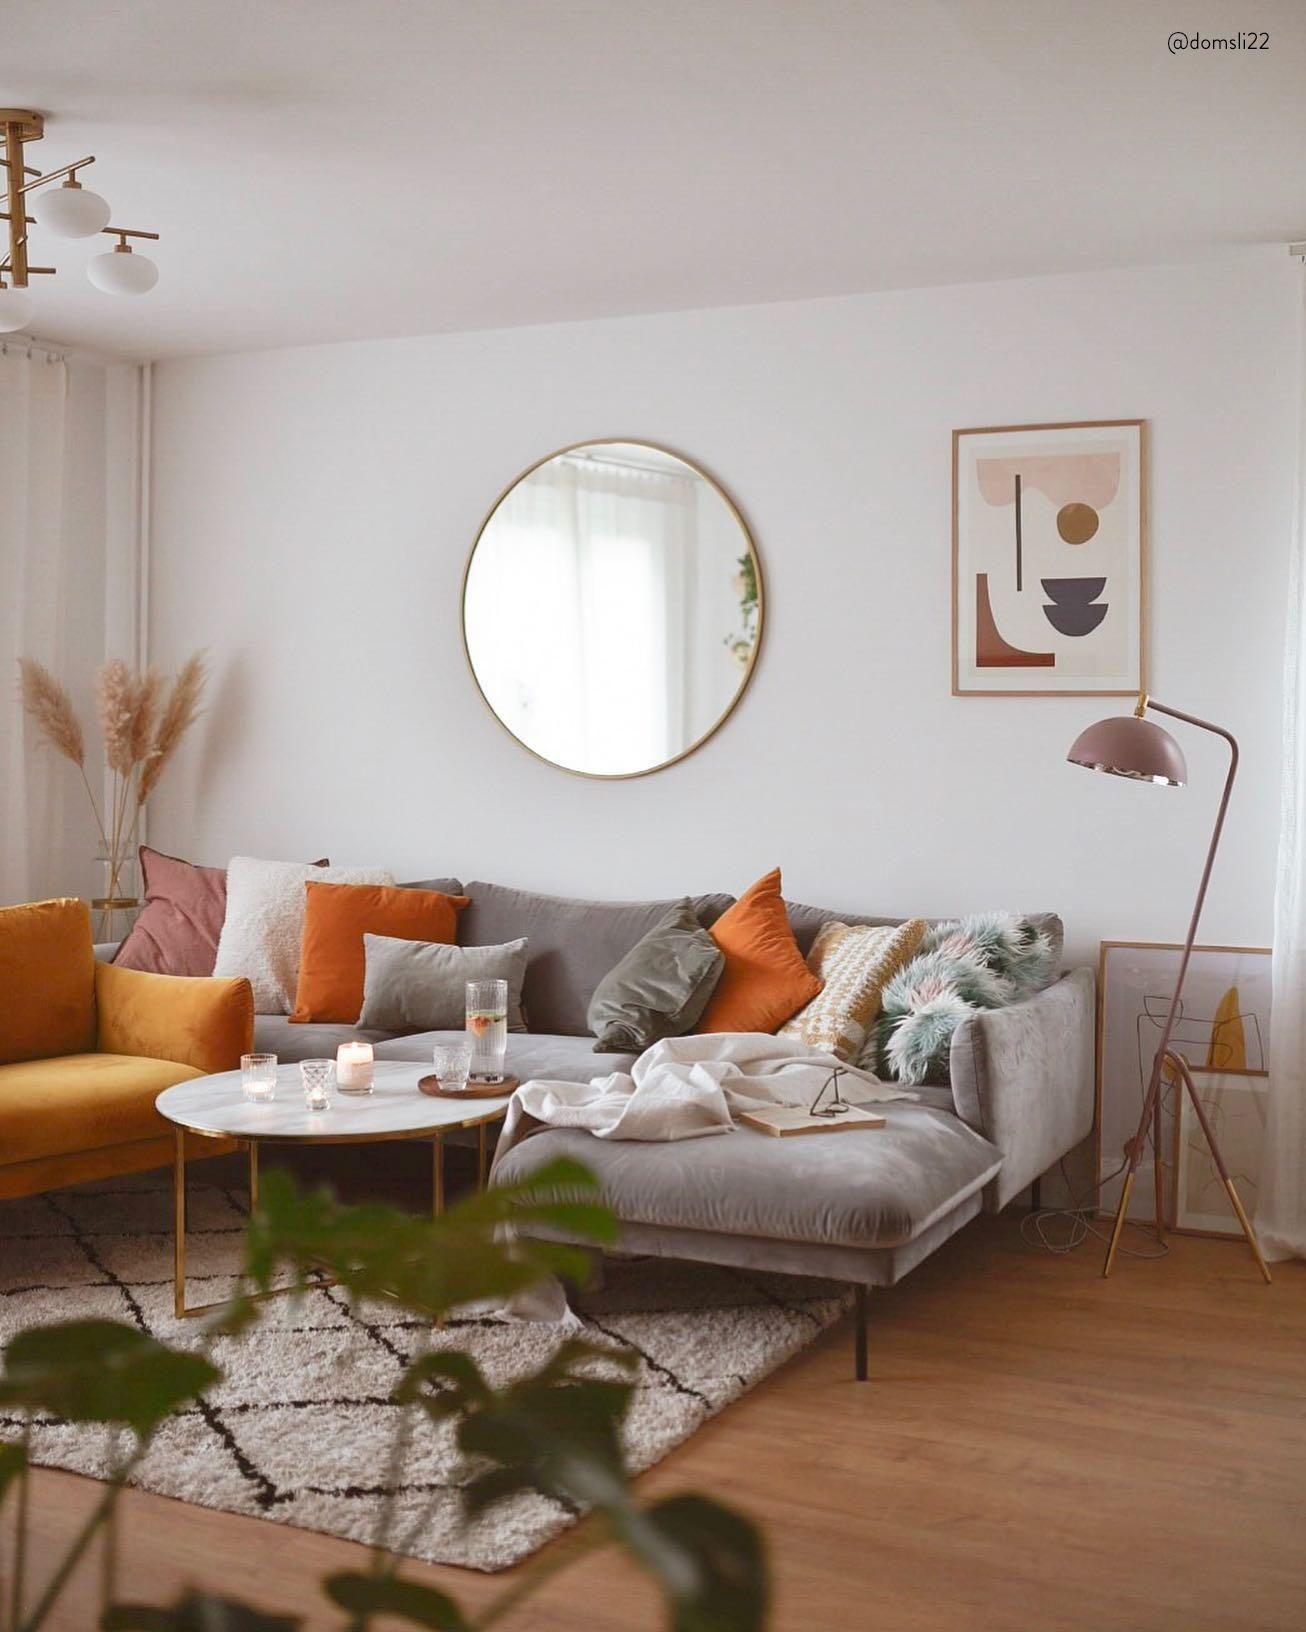 Sofas online kaufen ❘ WestwingNow   Funky living rooms, Unique ...